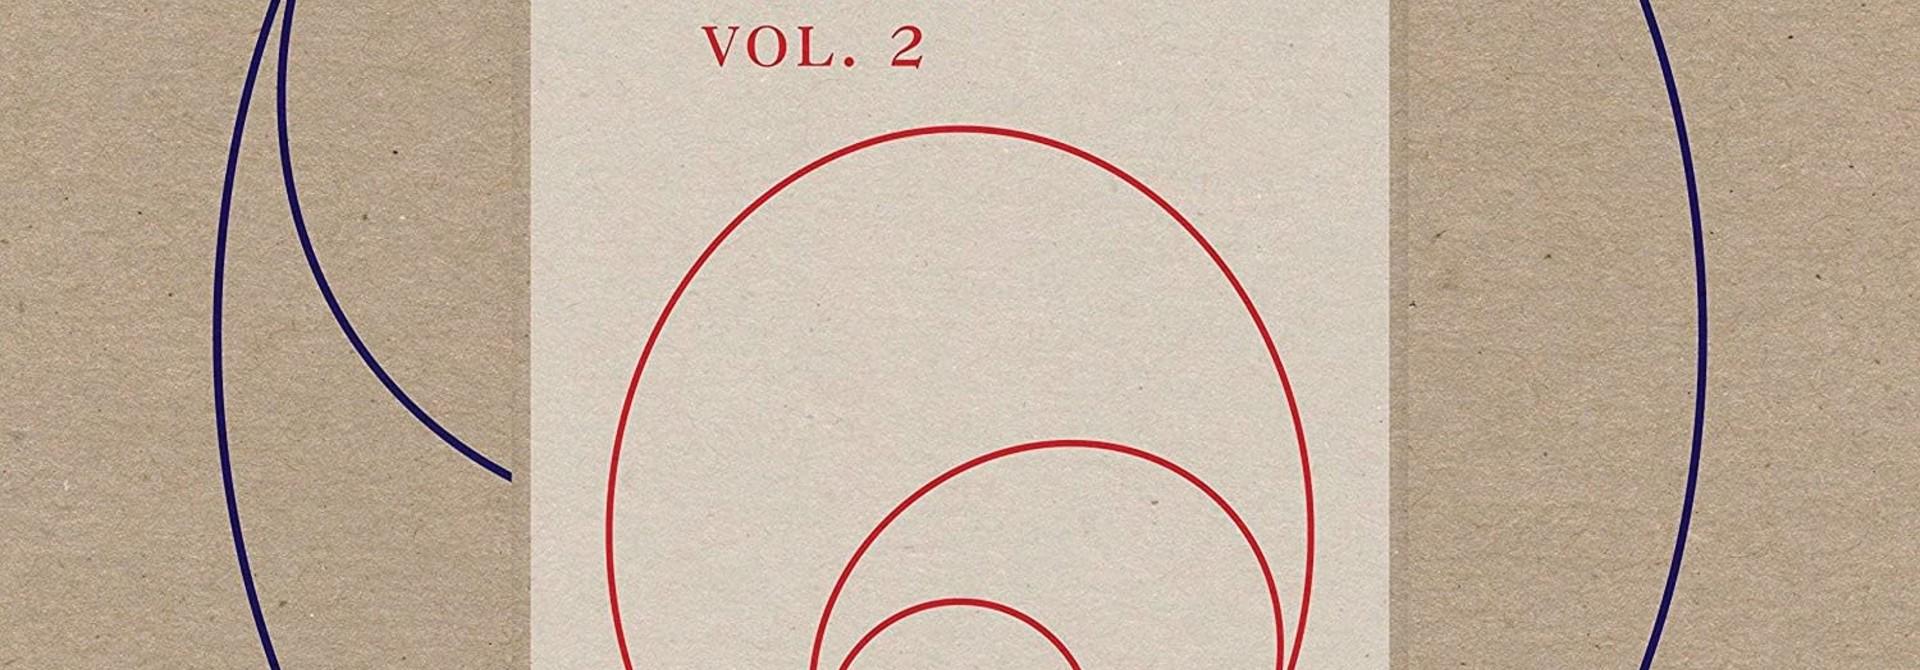 Craig Leon • Anthology of Interplanetary Folk Music Vol.2 : The Canon